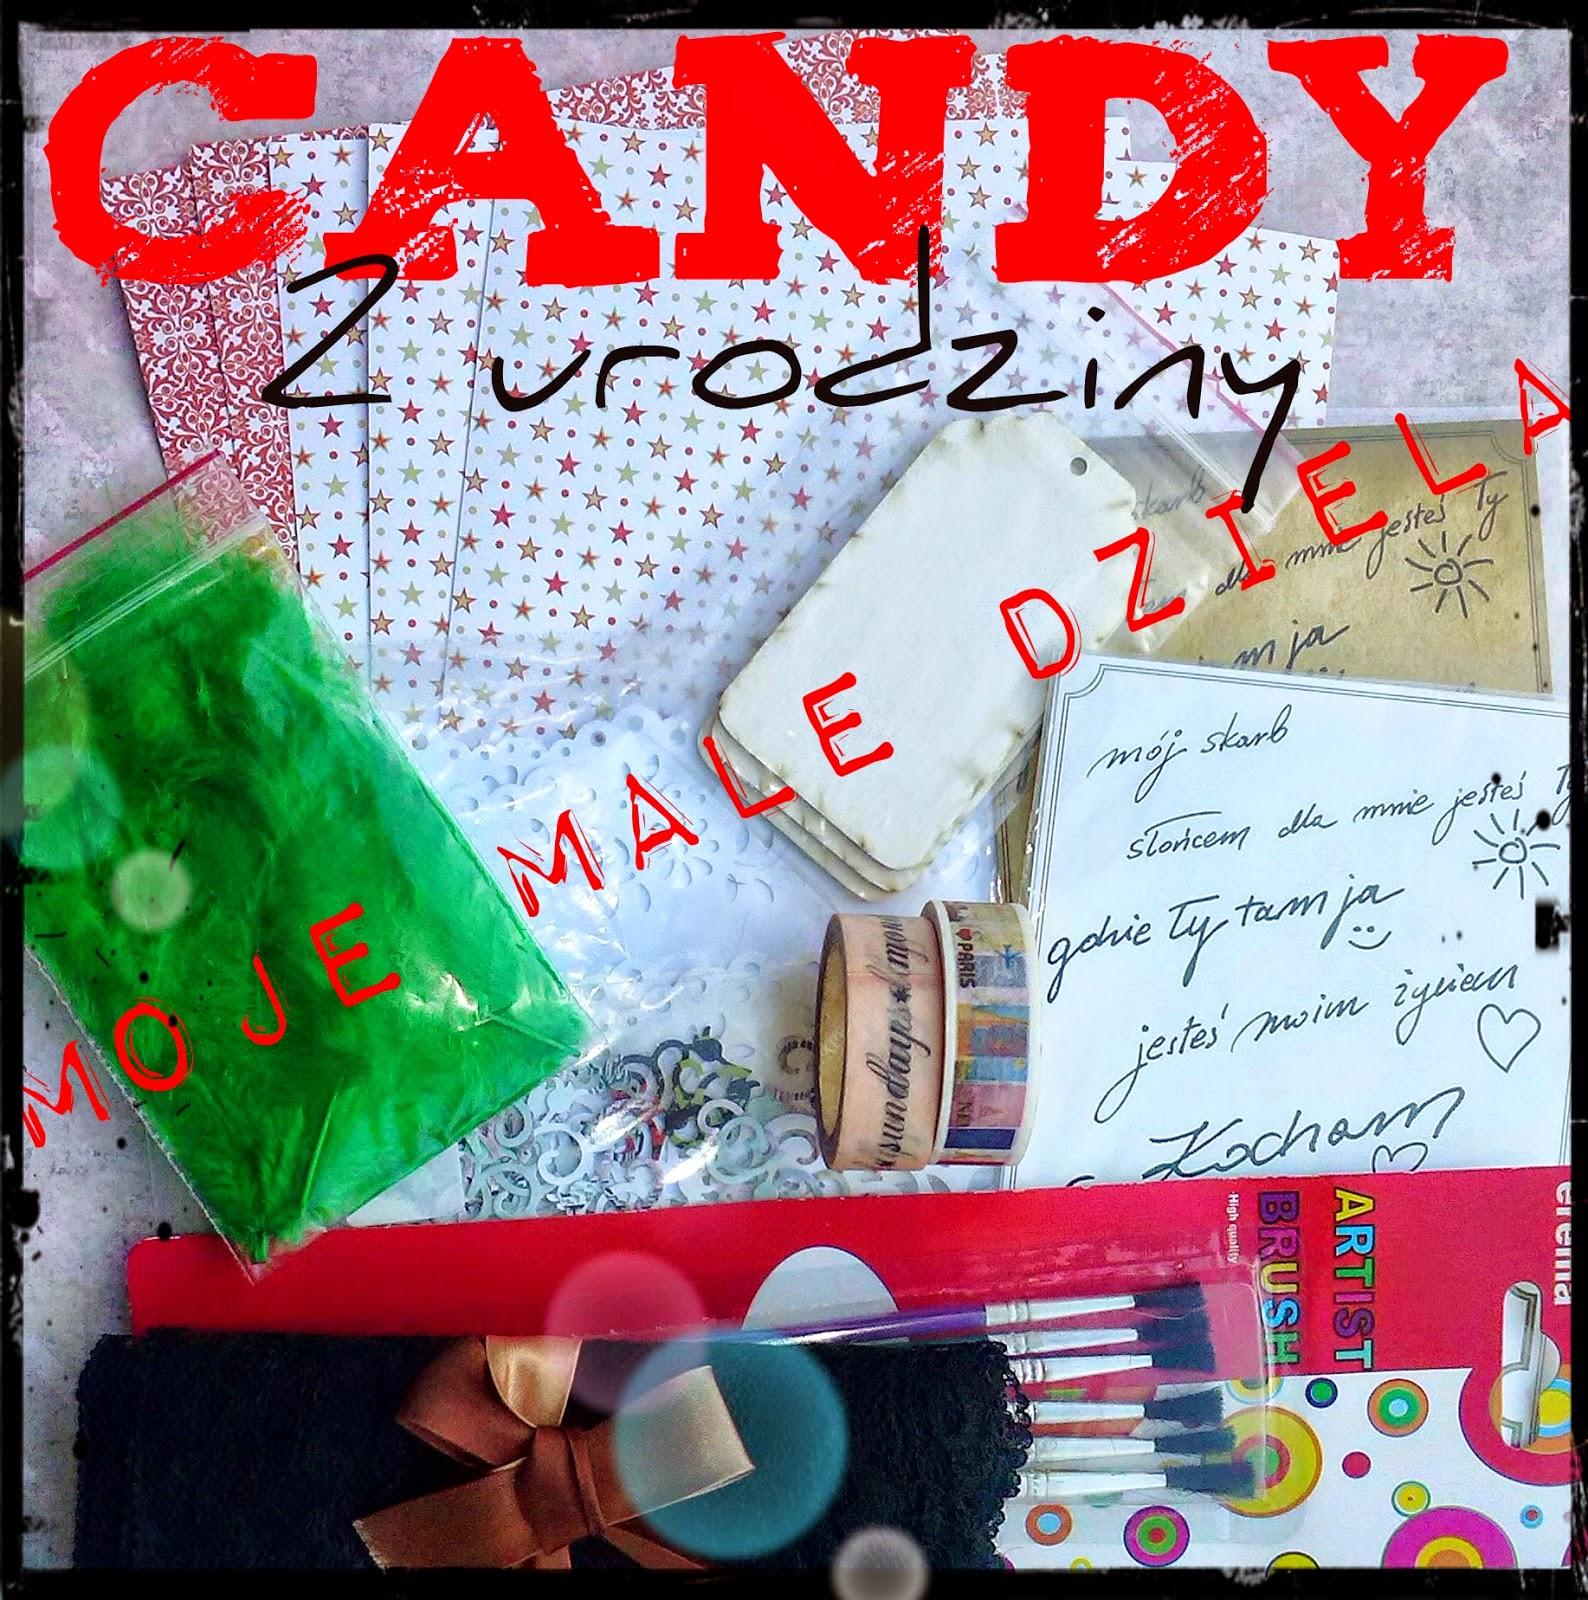 http://efkakartki.blogspot.com/2015/02/candy-2-urodziny-moje-mae-dziea.html